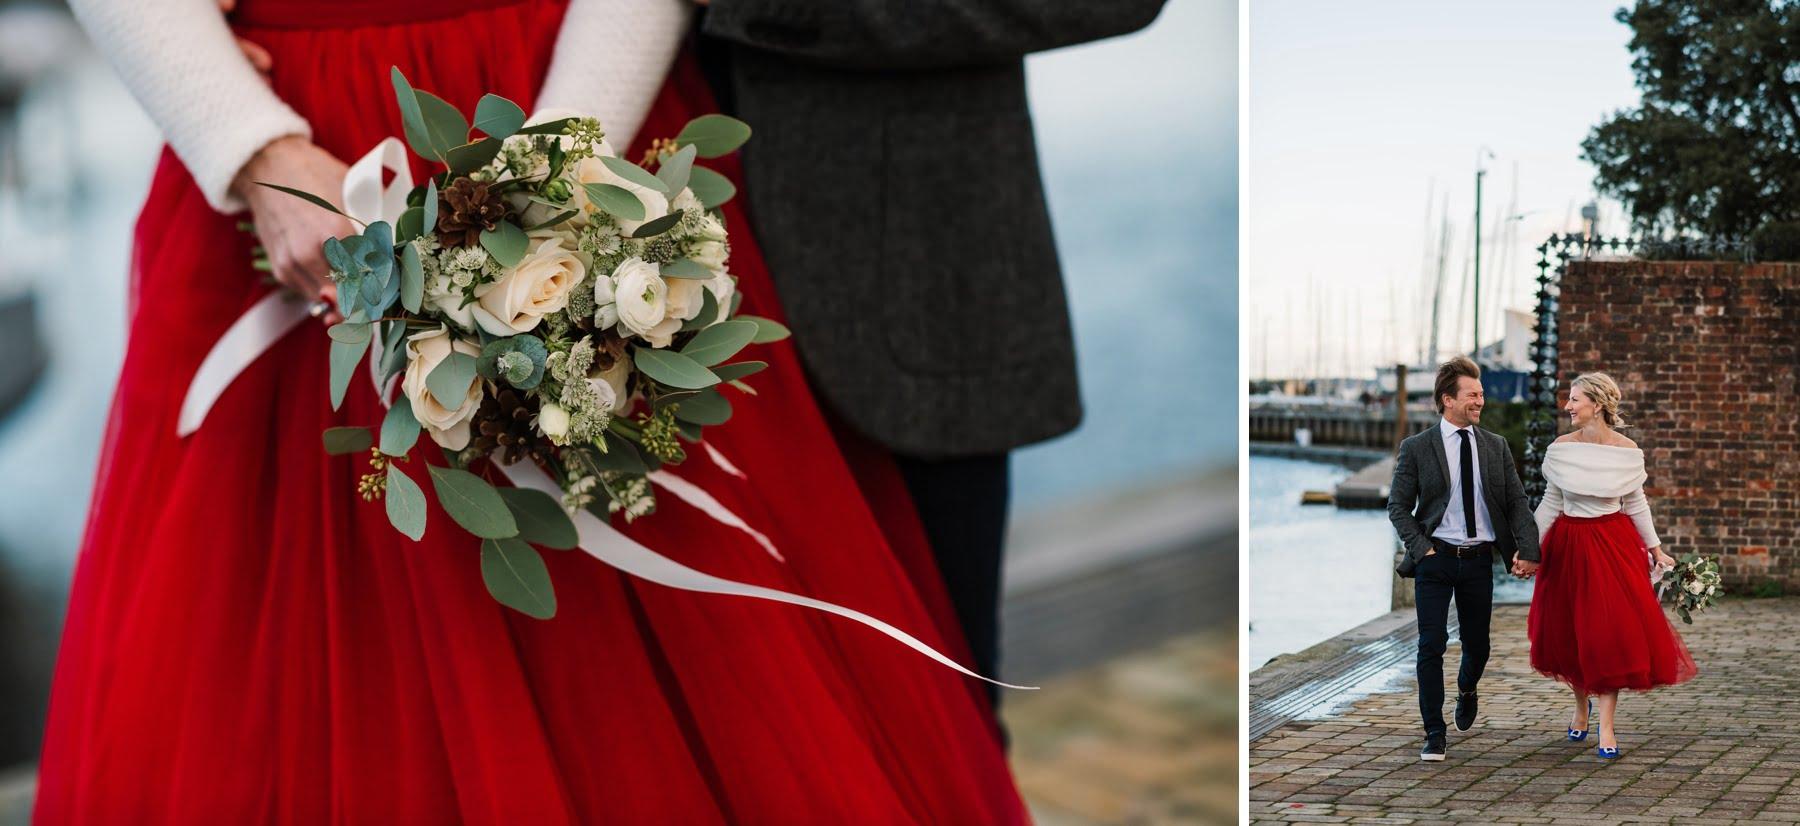 Christmas Eve wedding photos at Lymington Quay